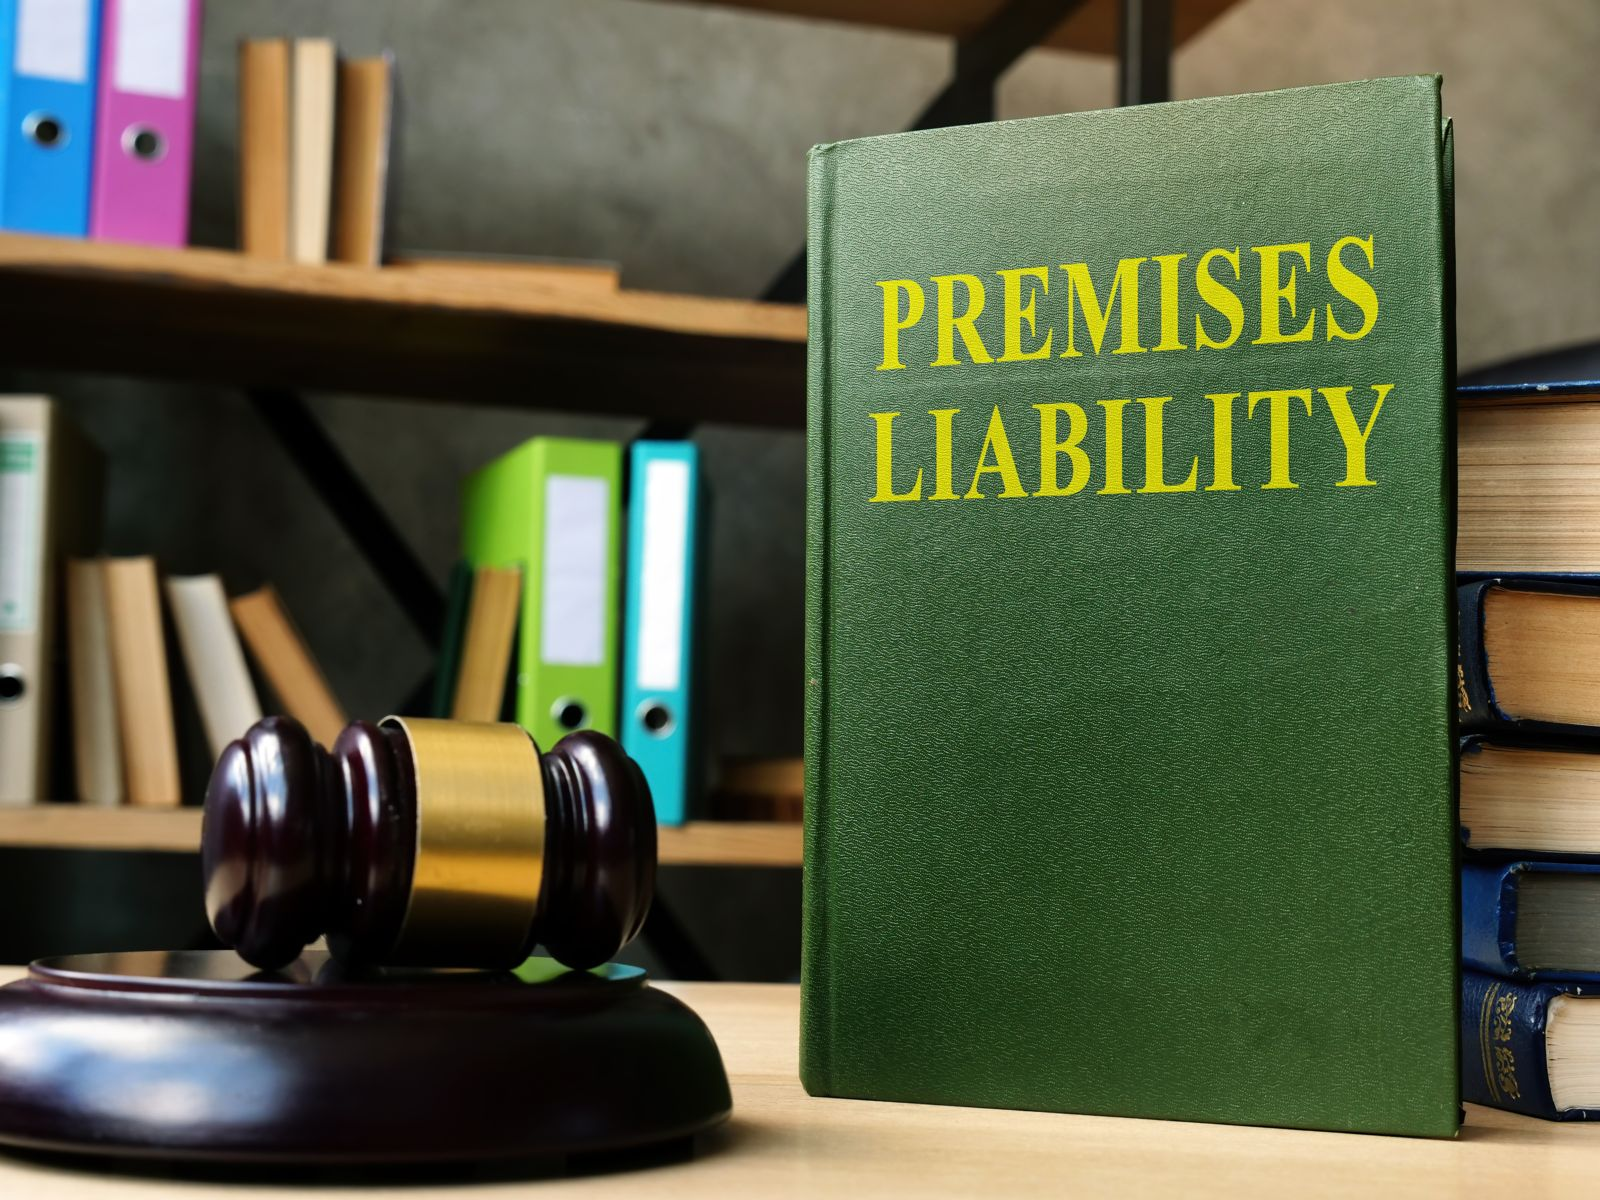 sioux falls premises liability attorney